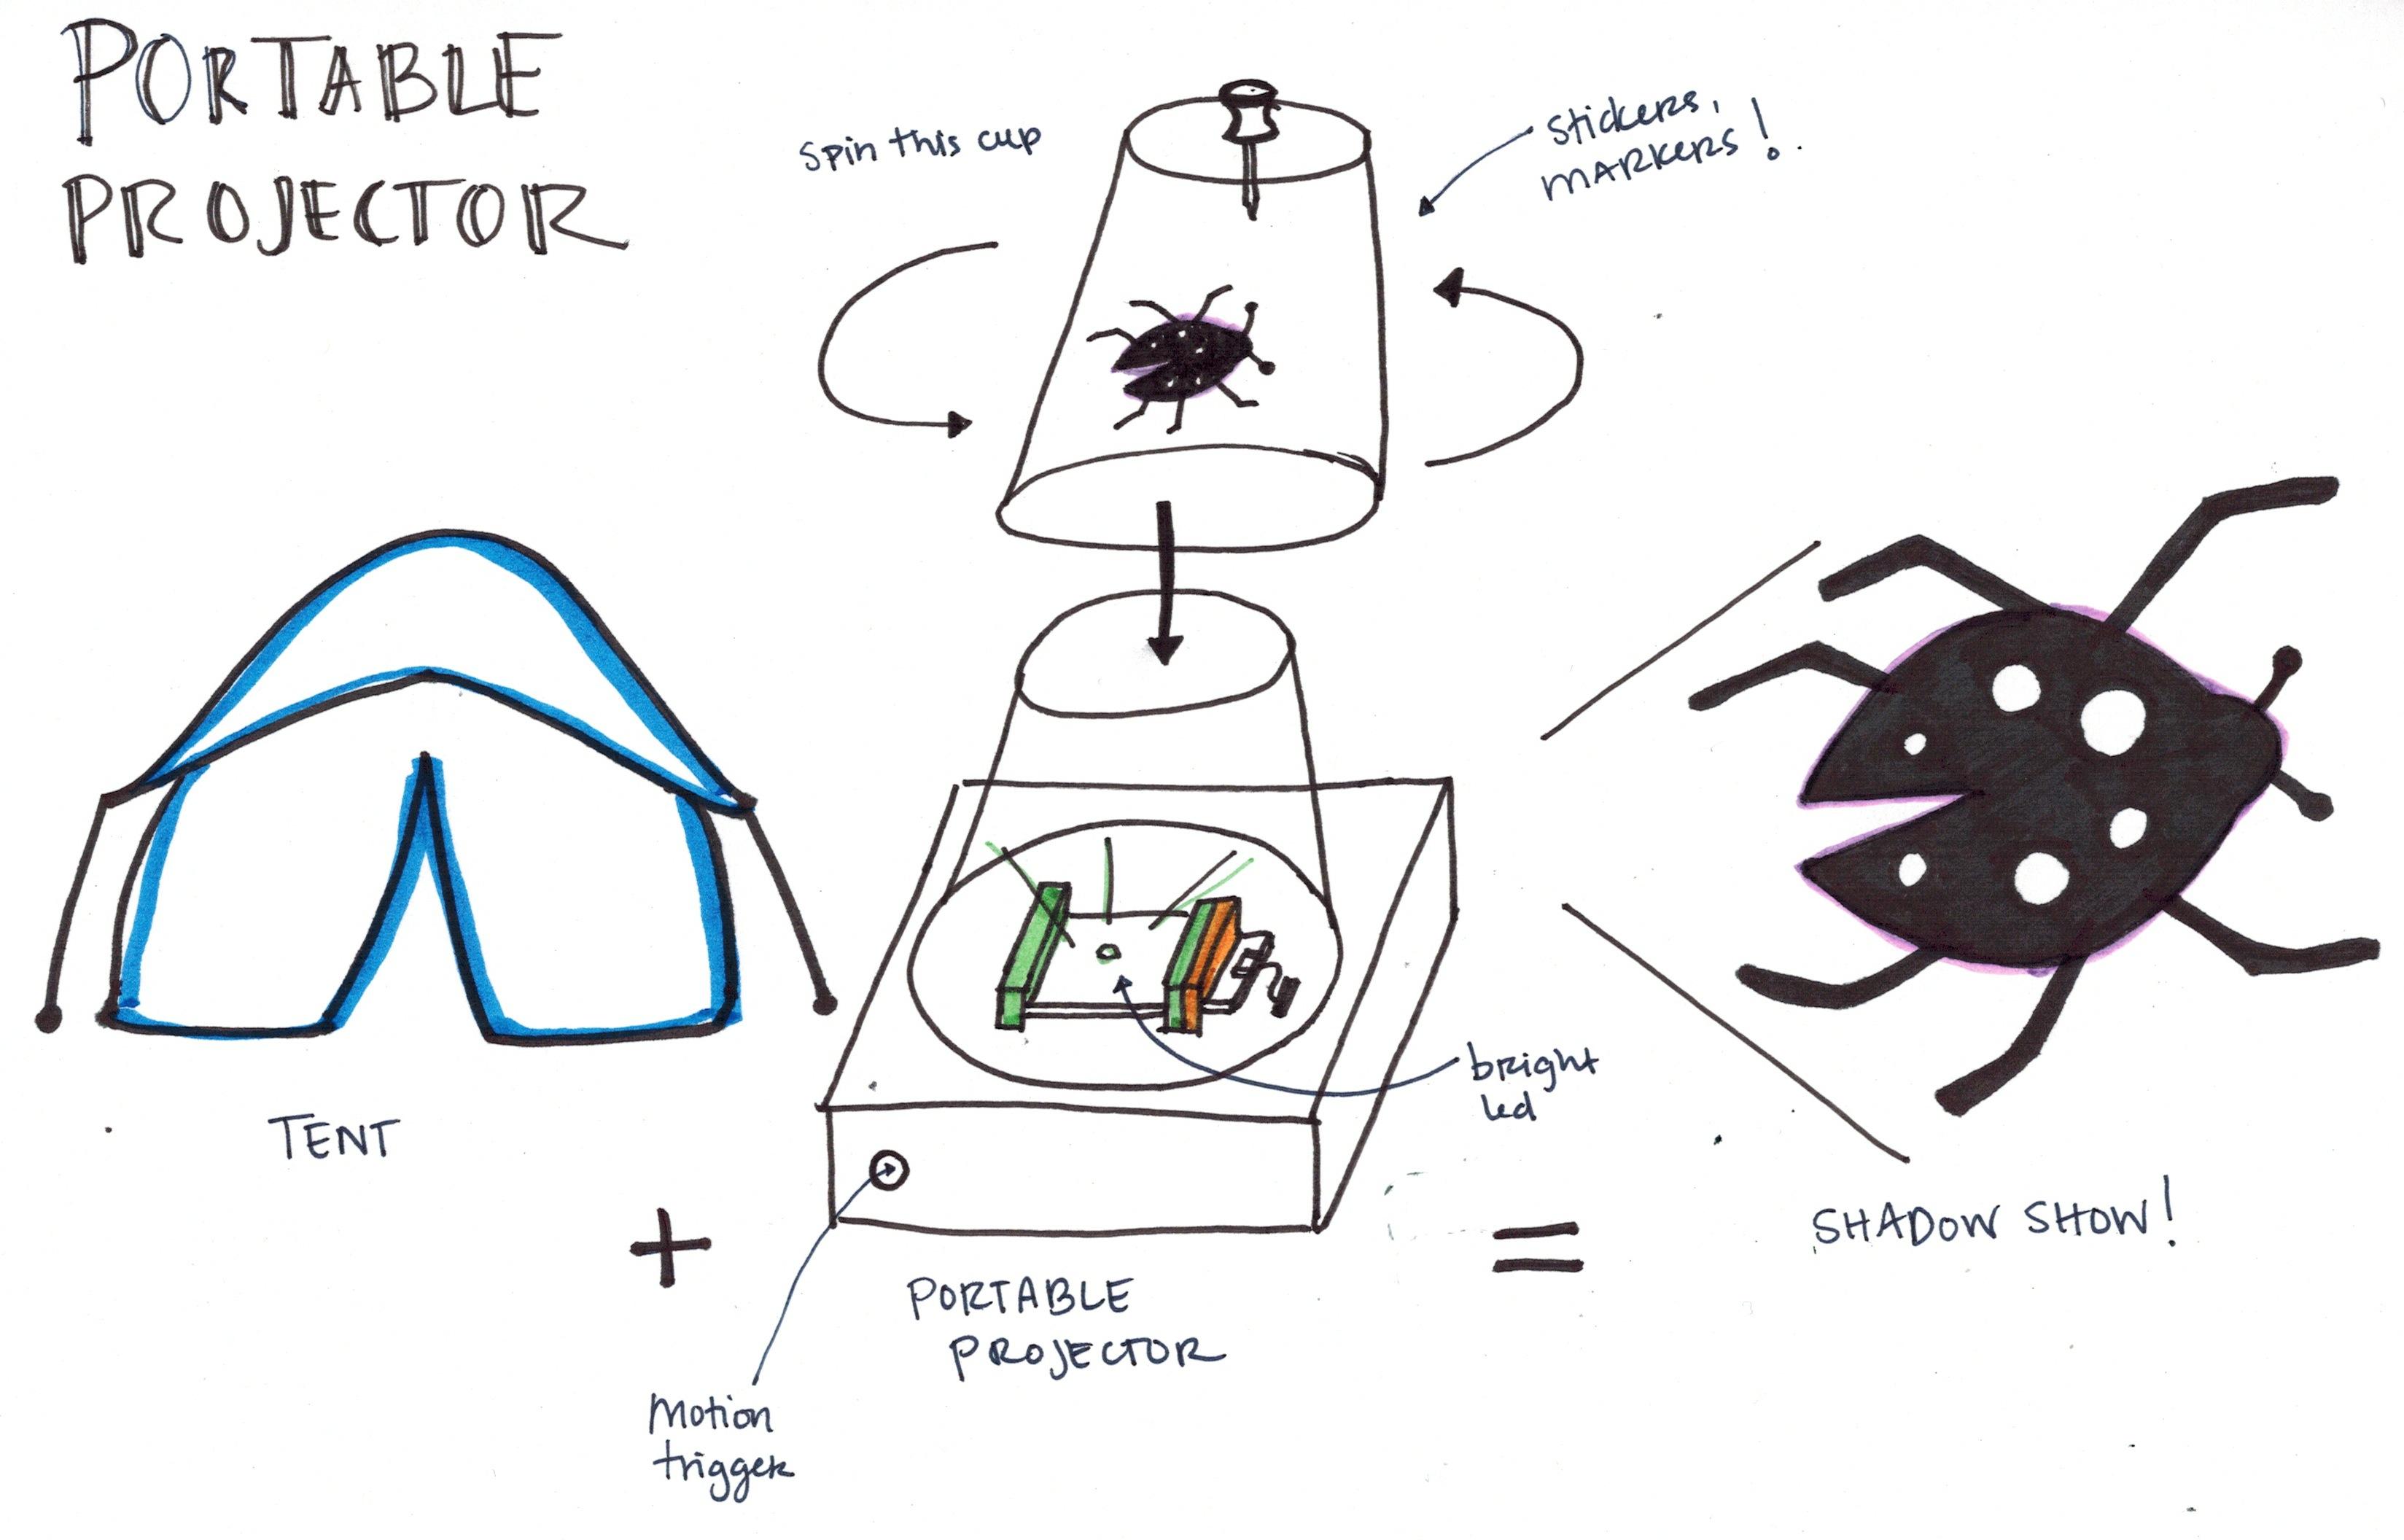 portable projector  a littlebits project by littlebits